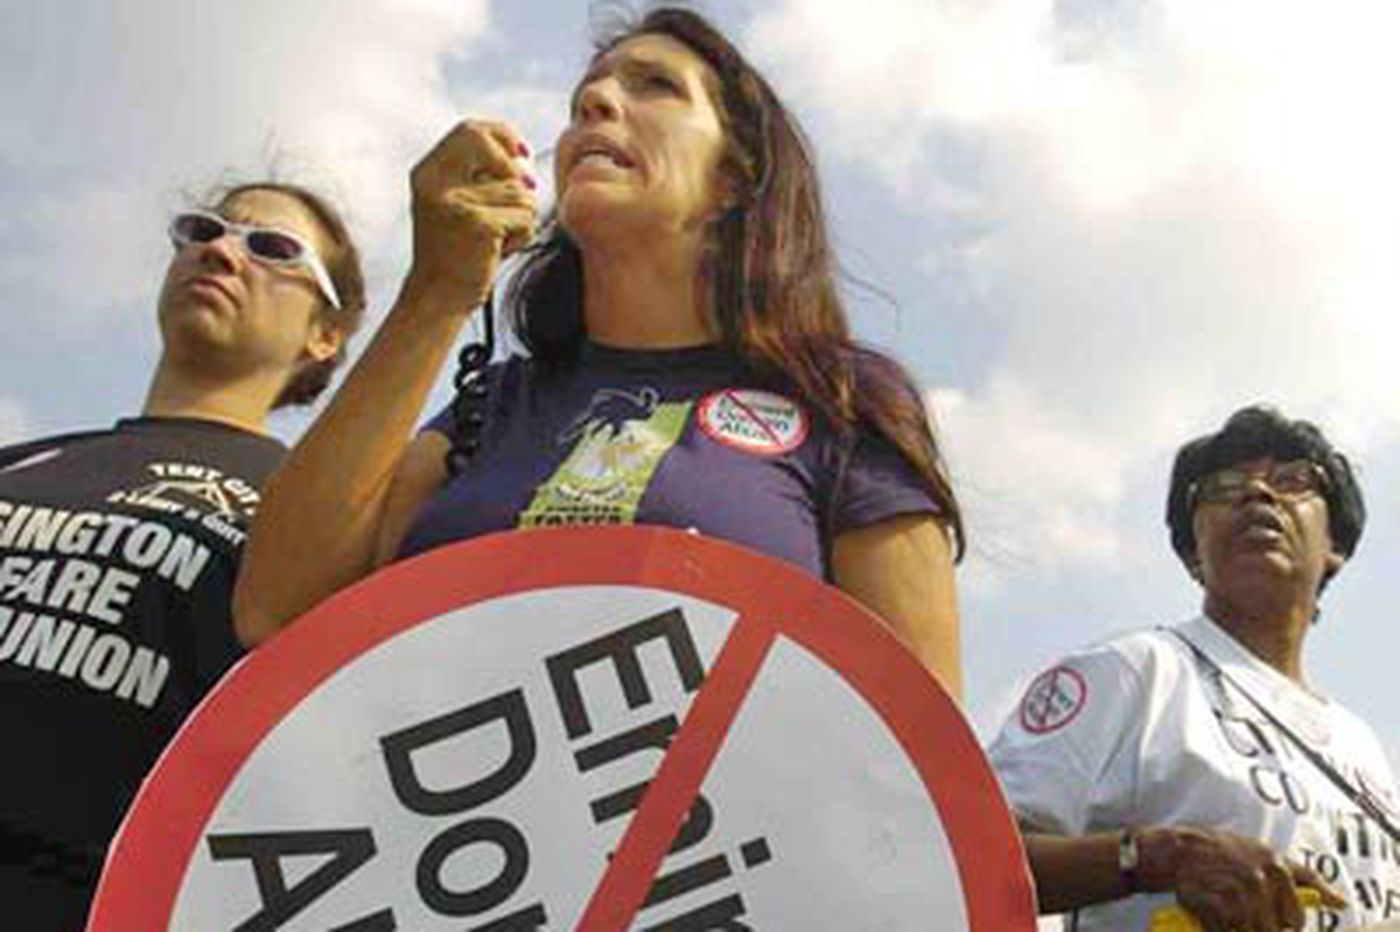 Monica Yant Kinney: Hard times bring veteran agitator Cheri Honkala back